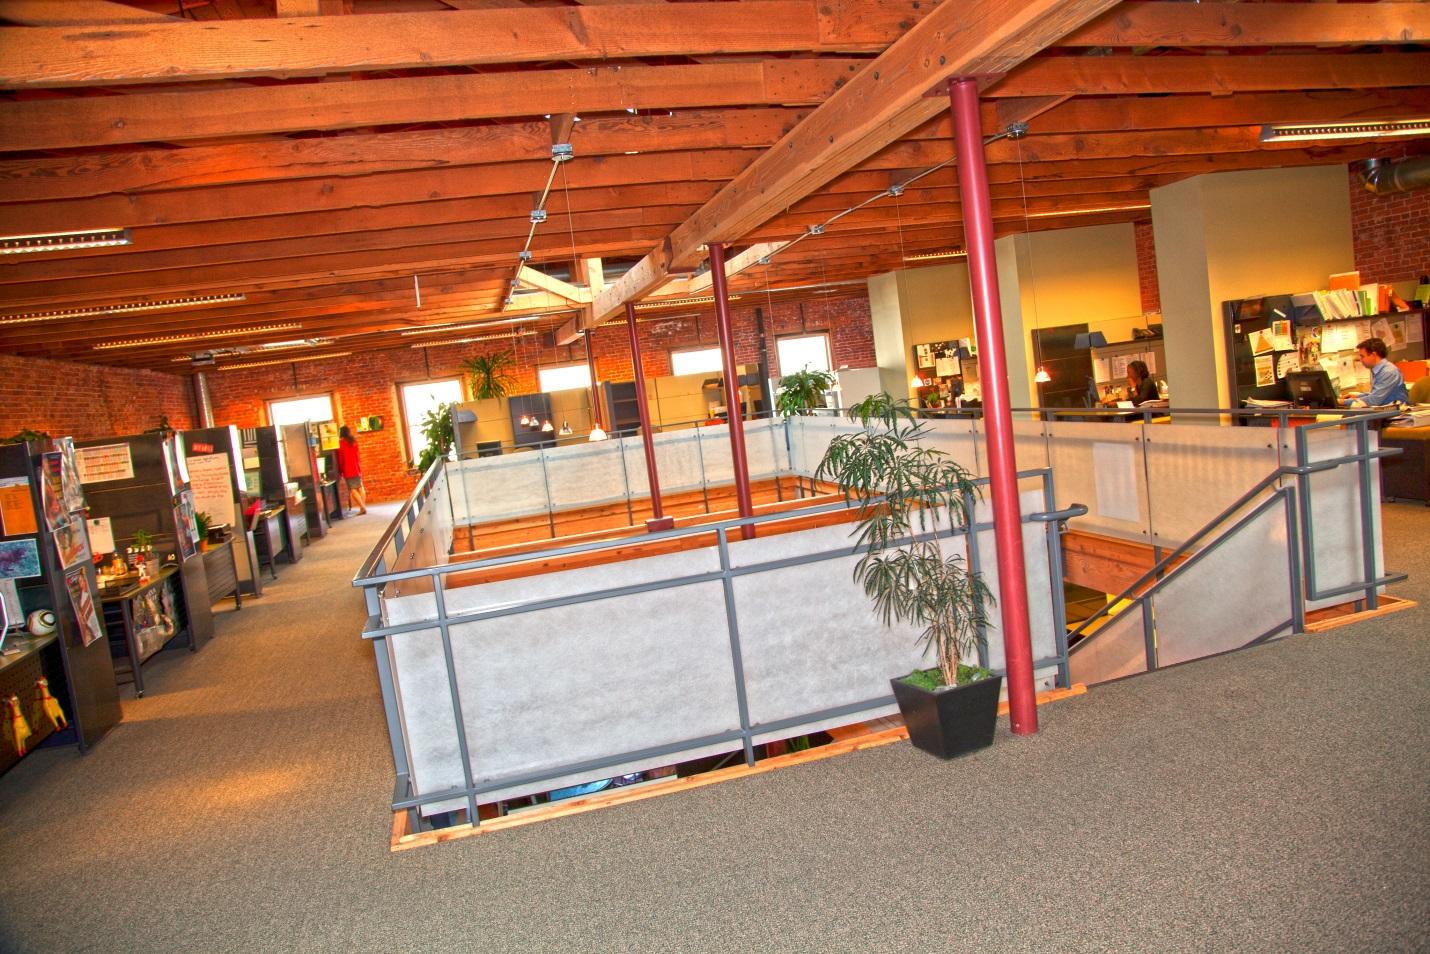 Interior of RSG's office